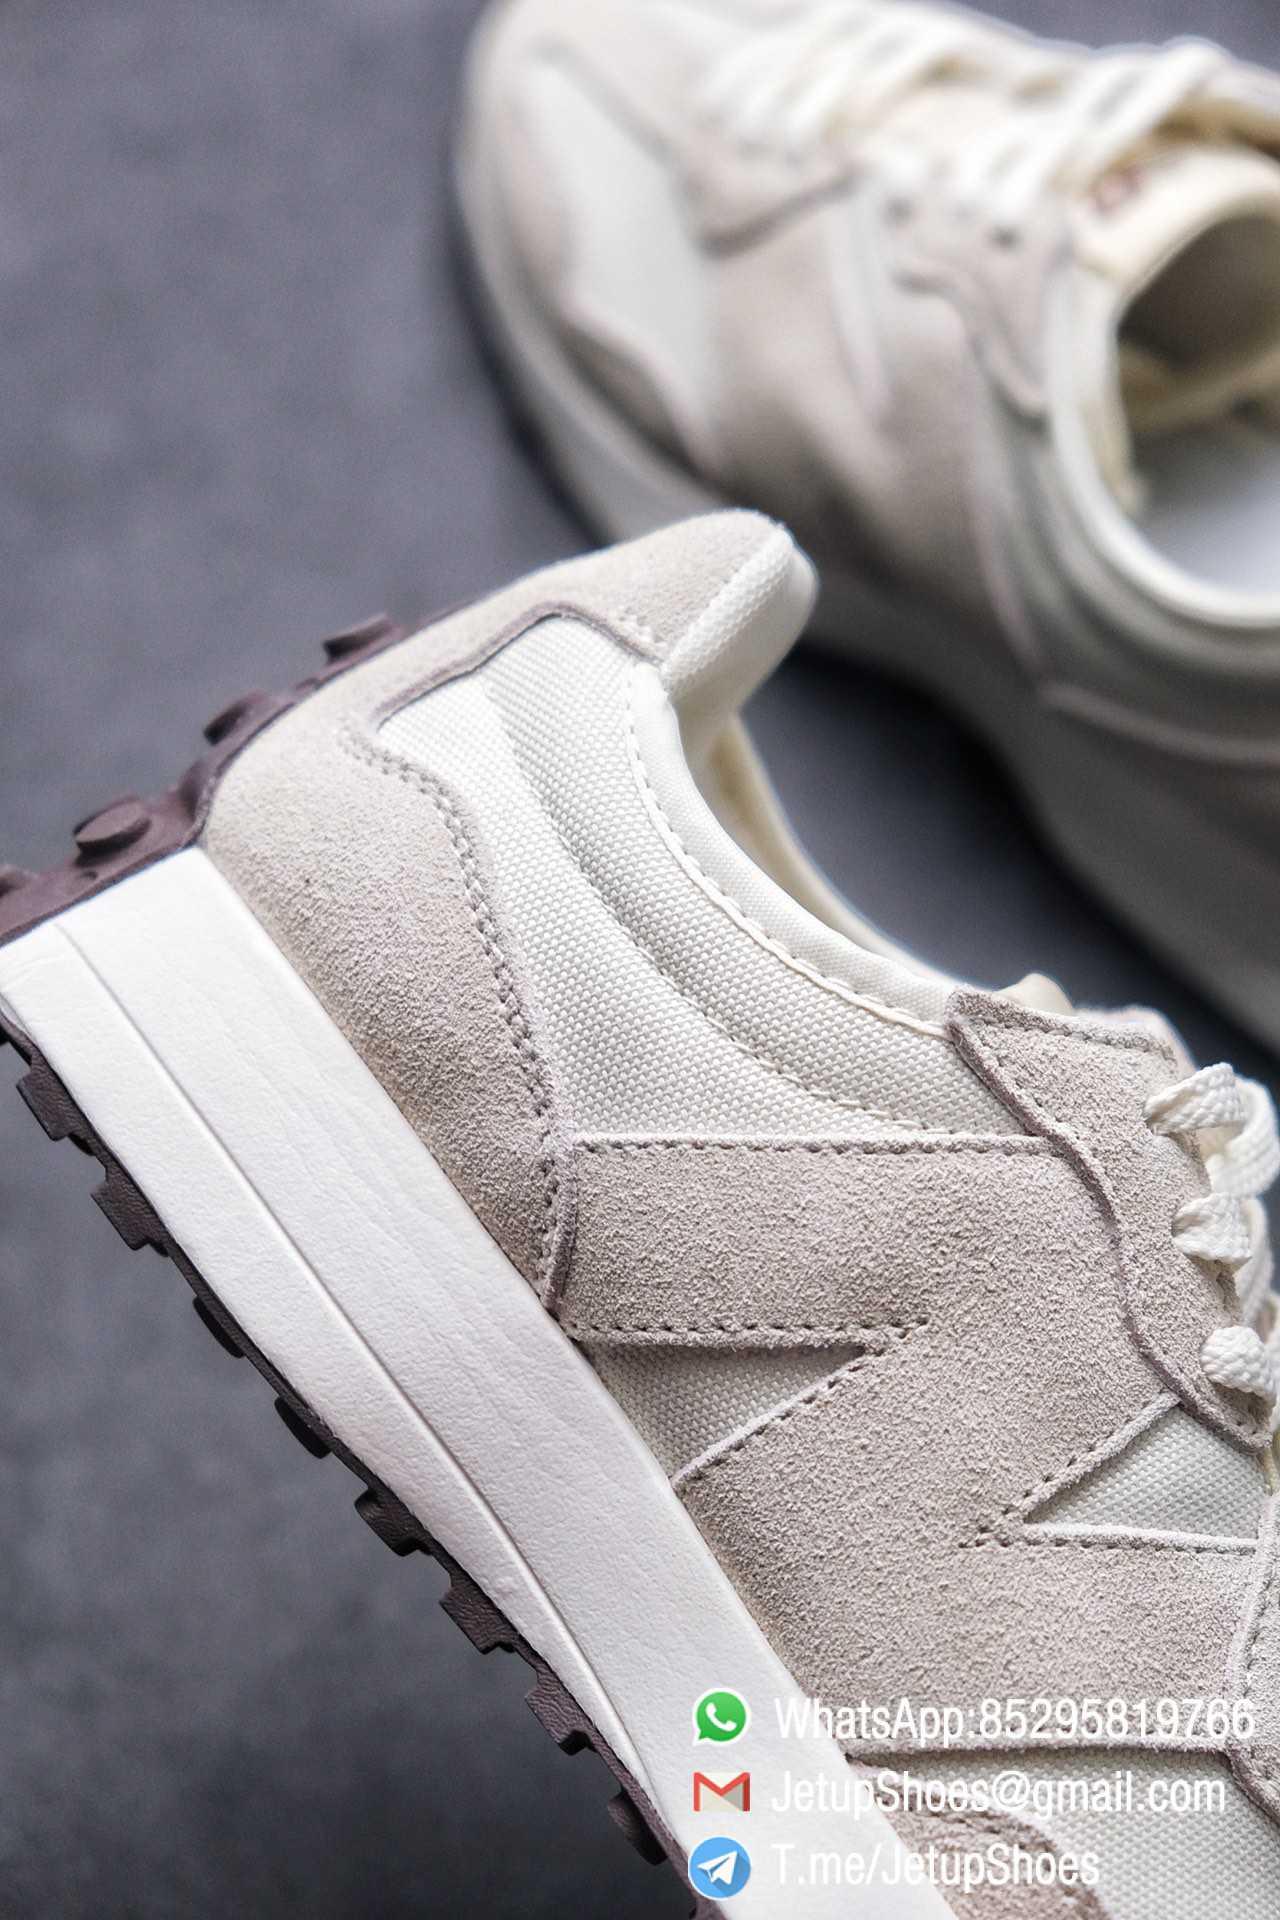 Replica Sneakers New Balance 327 Noritake x 327 Light Grey White Mesh Quarter Suede Upper Retro Running Shoes SKU WS327FB 06